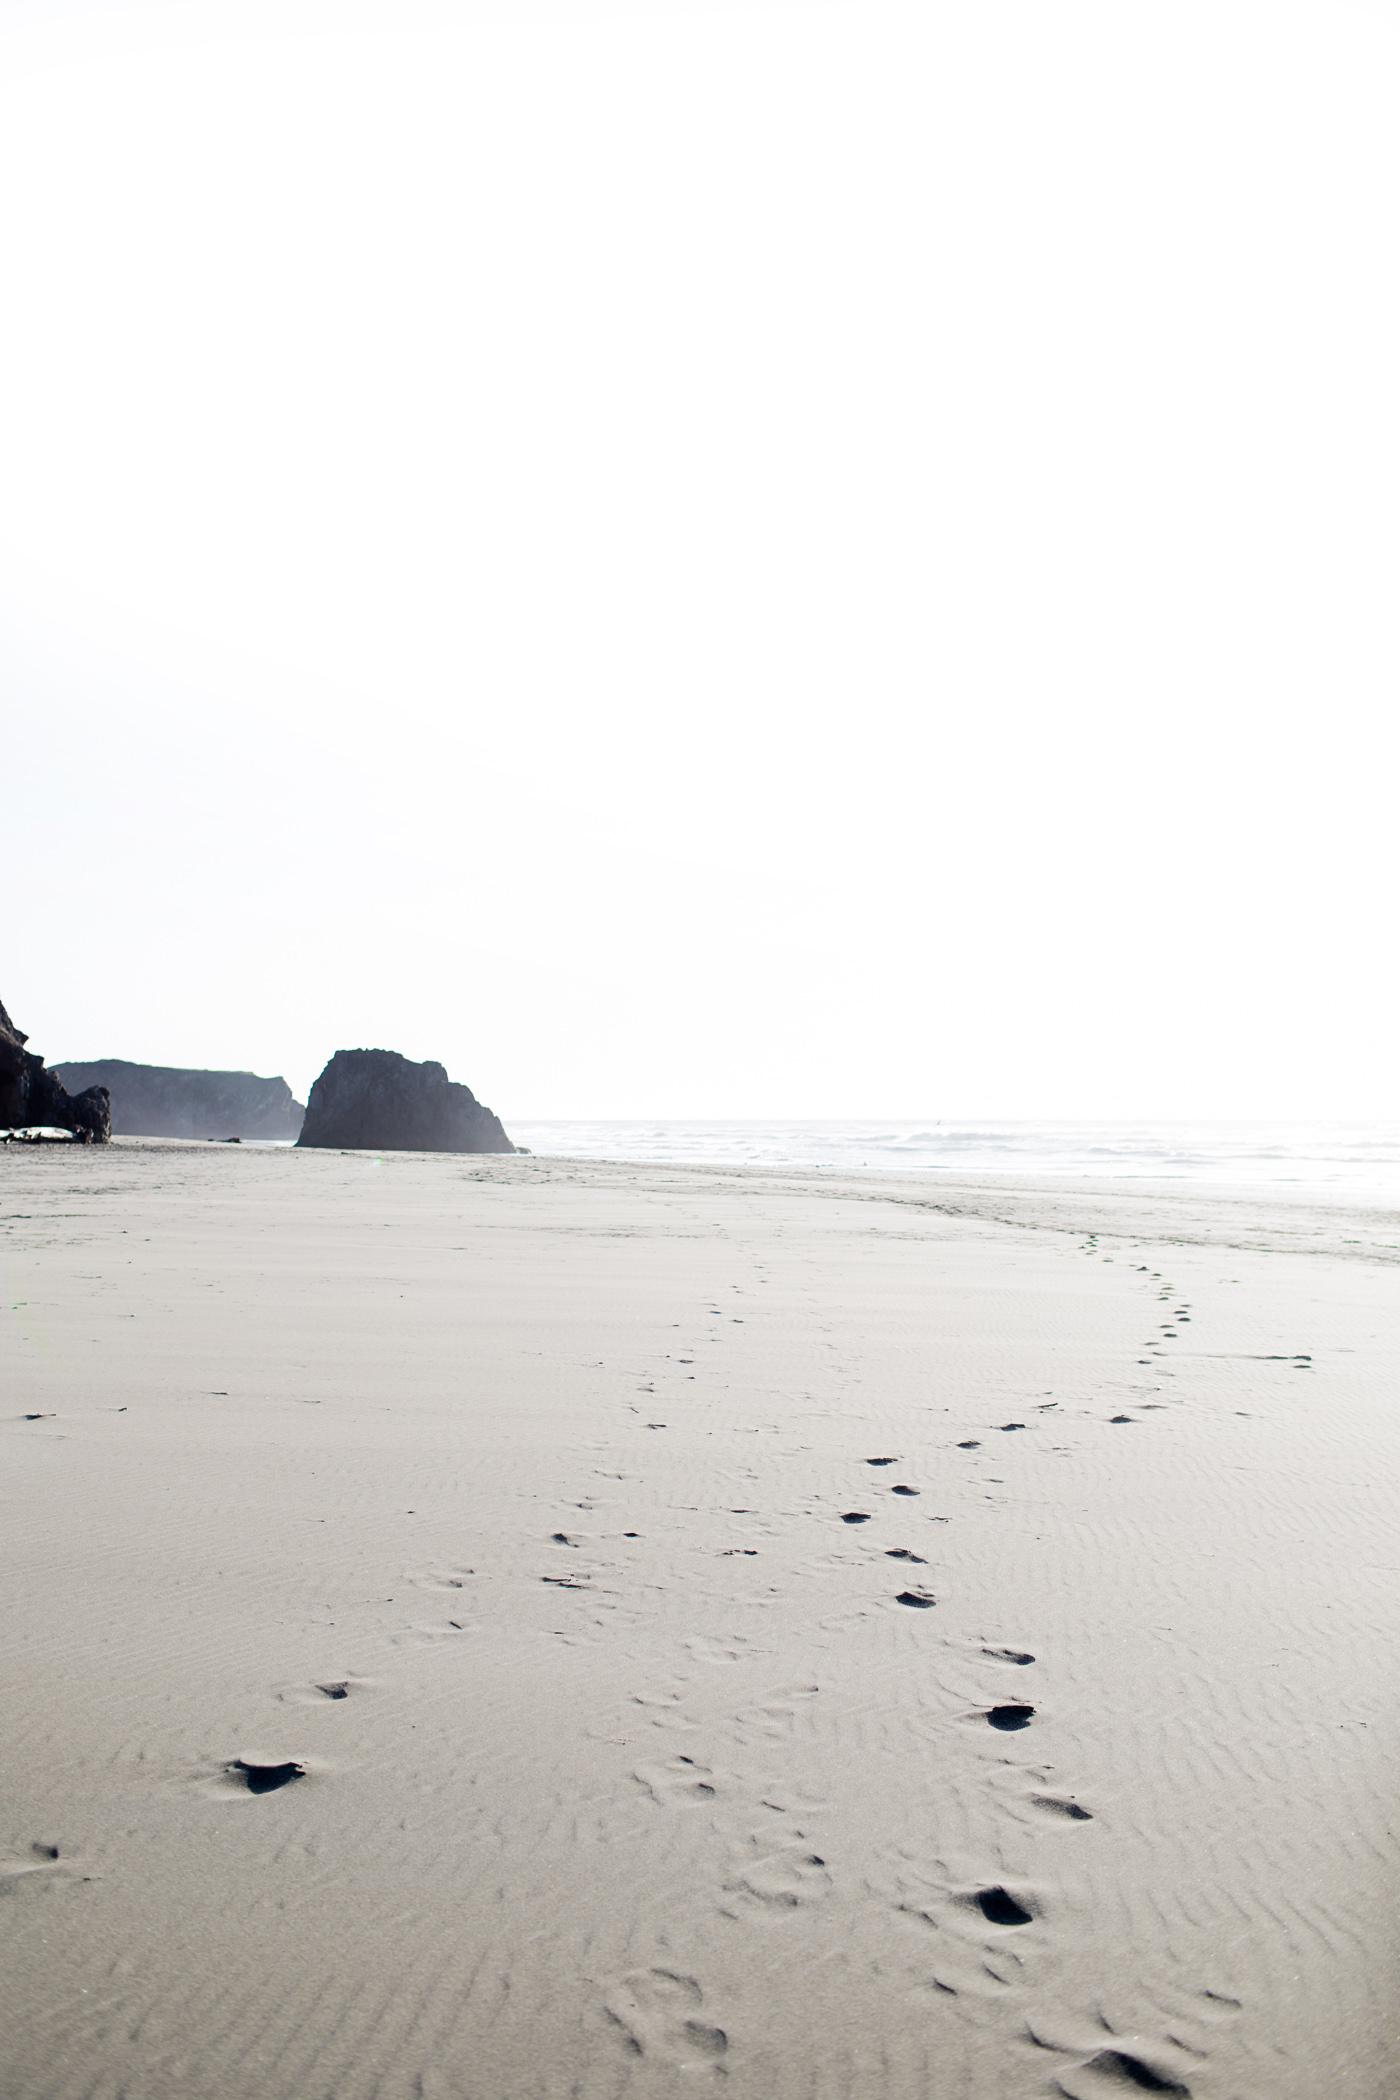 Seaside Beach, north of Fort Bragg, California